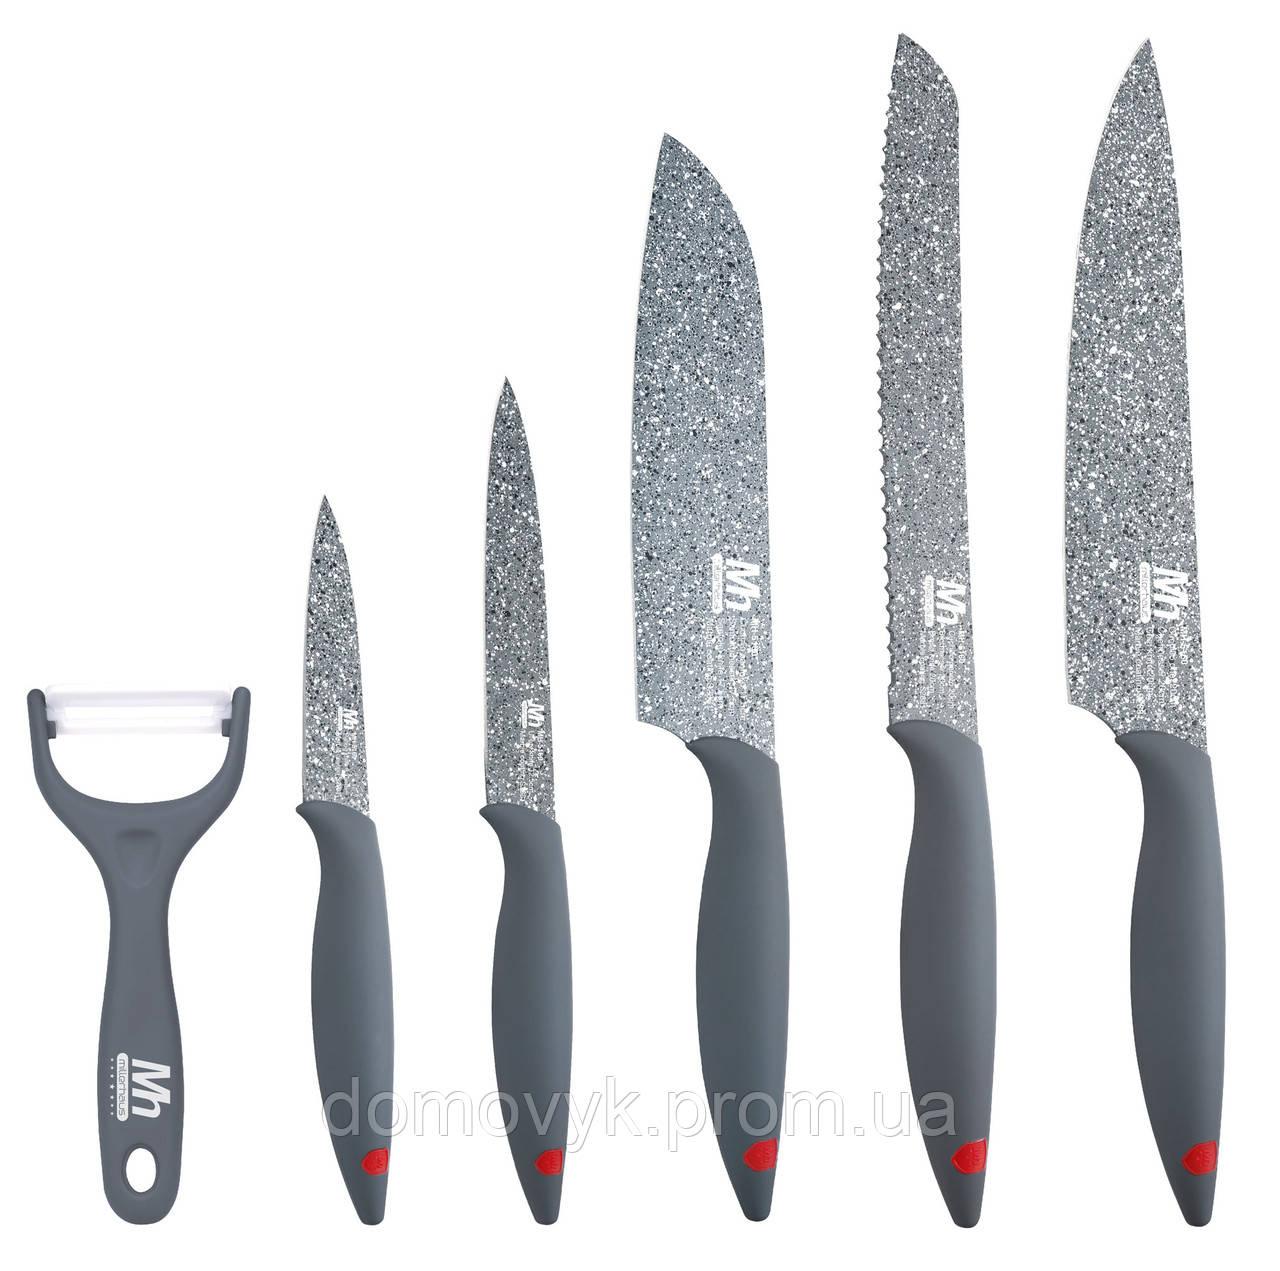 Набор ножей 6 пр. Millerhaus Marcus (MH-5160)